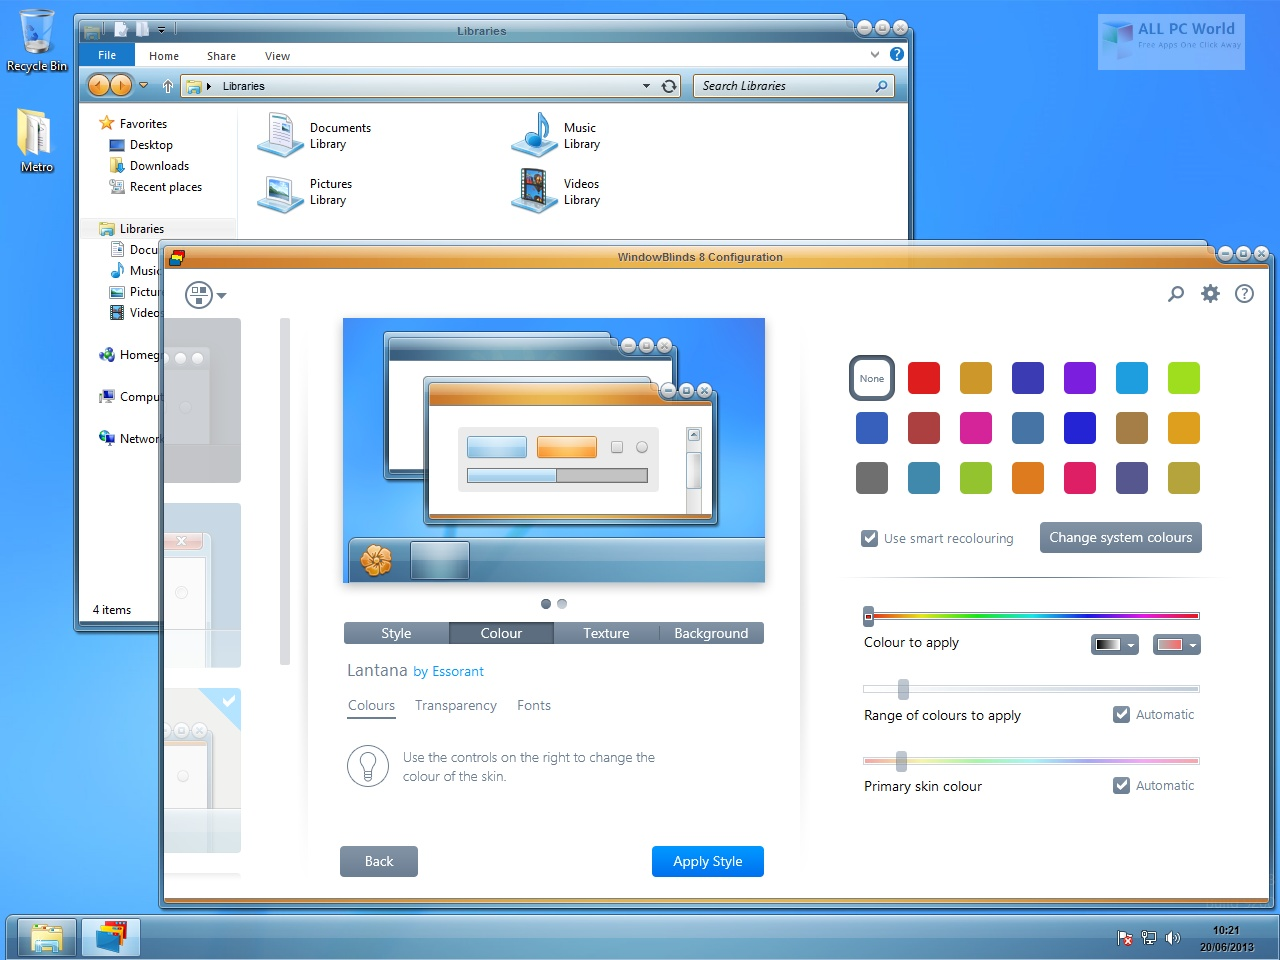 Stardock WindowBlinds 10.85 Free Download